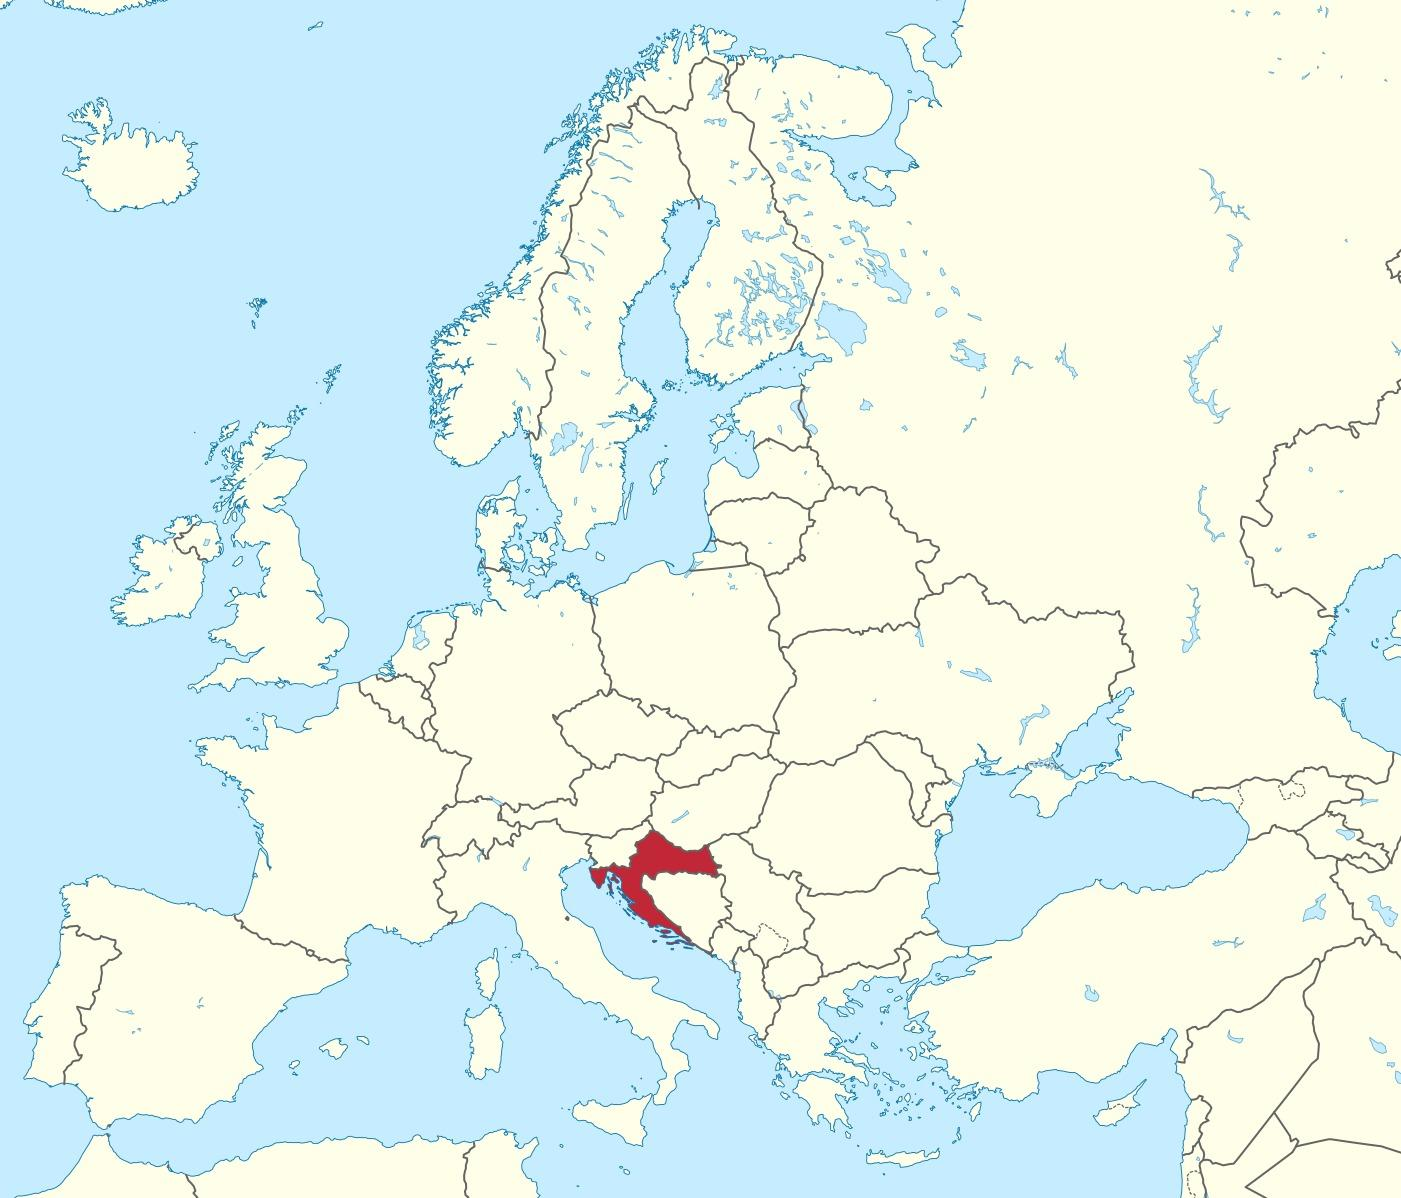 kart kroatia Kroatia kart europa   Kroatia i kart over europa (Sør Europa   Europa)